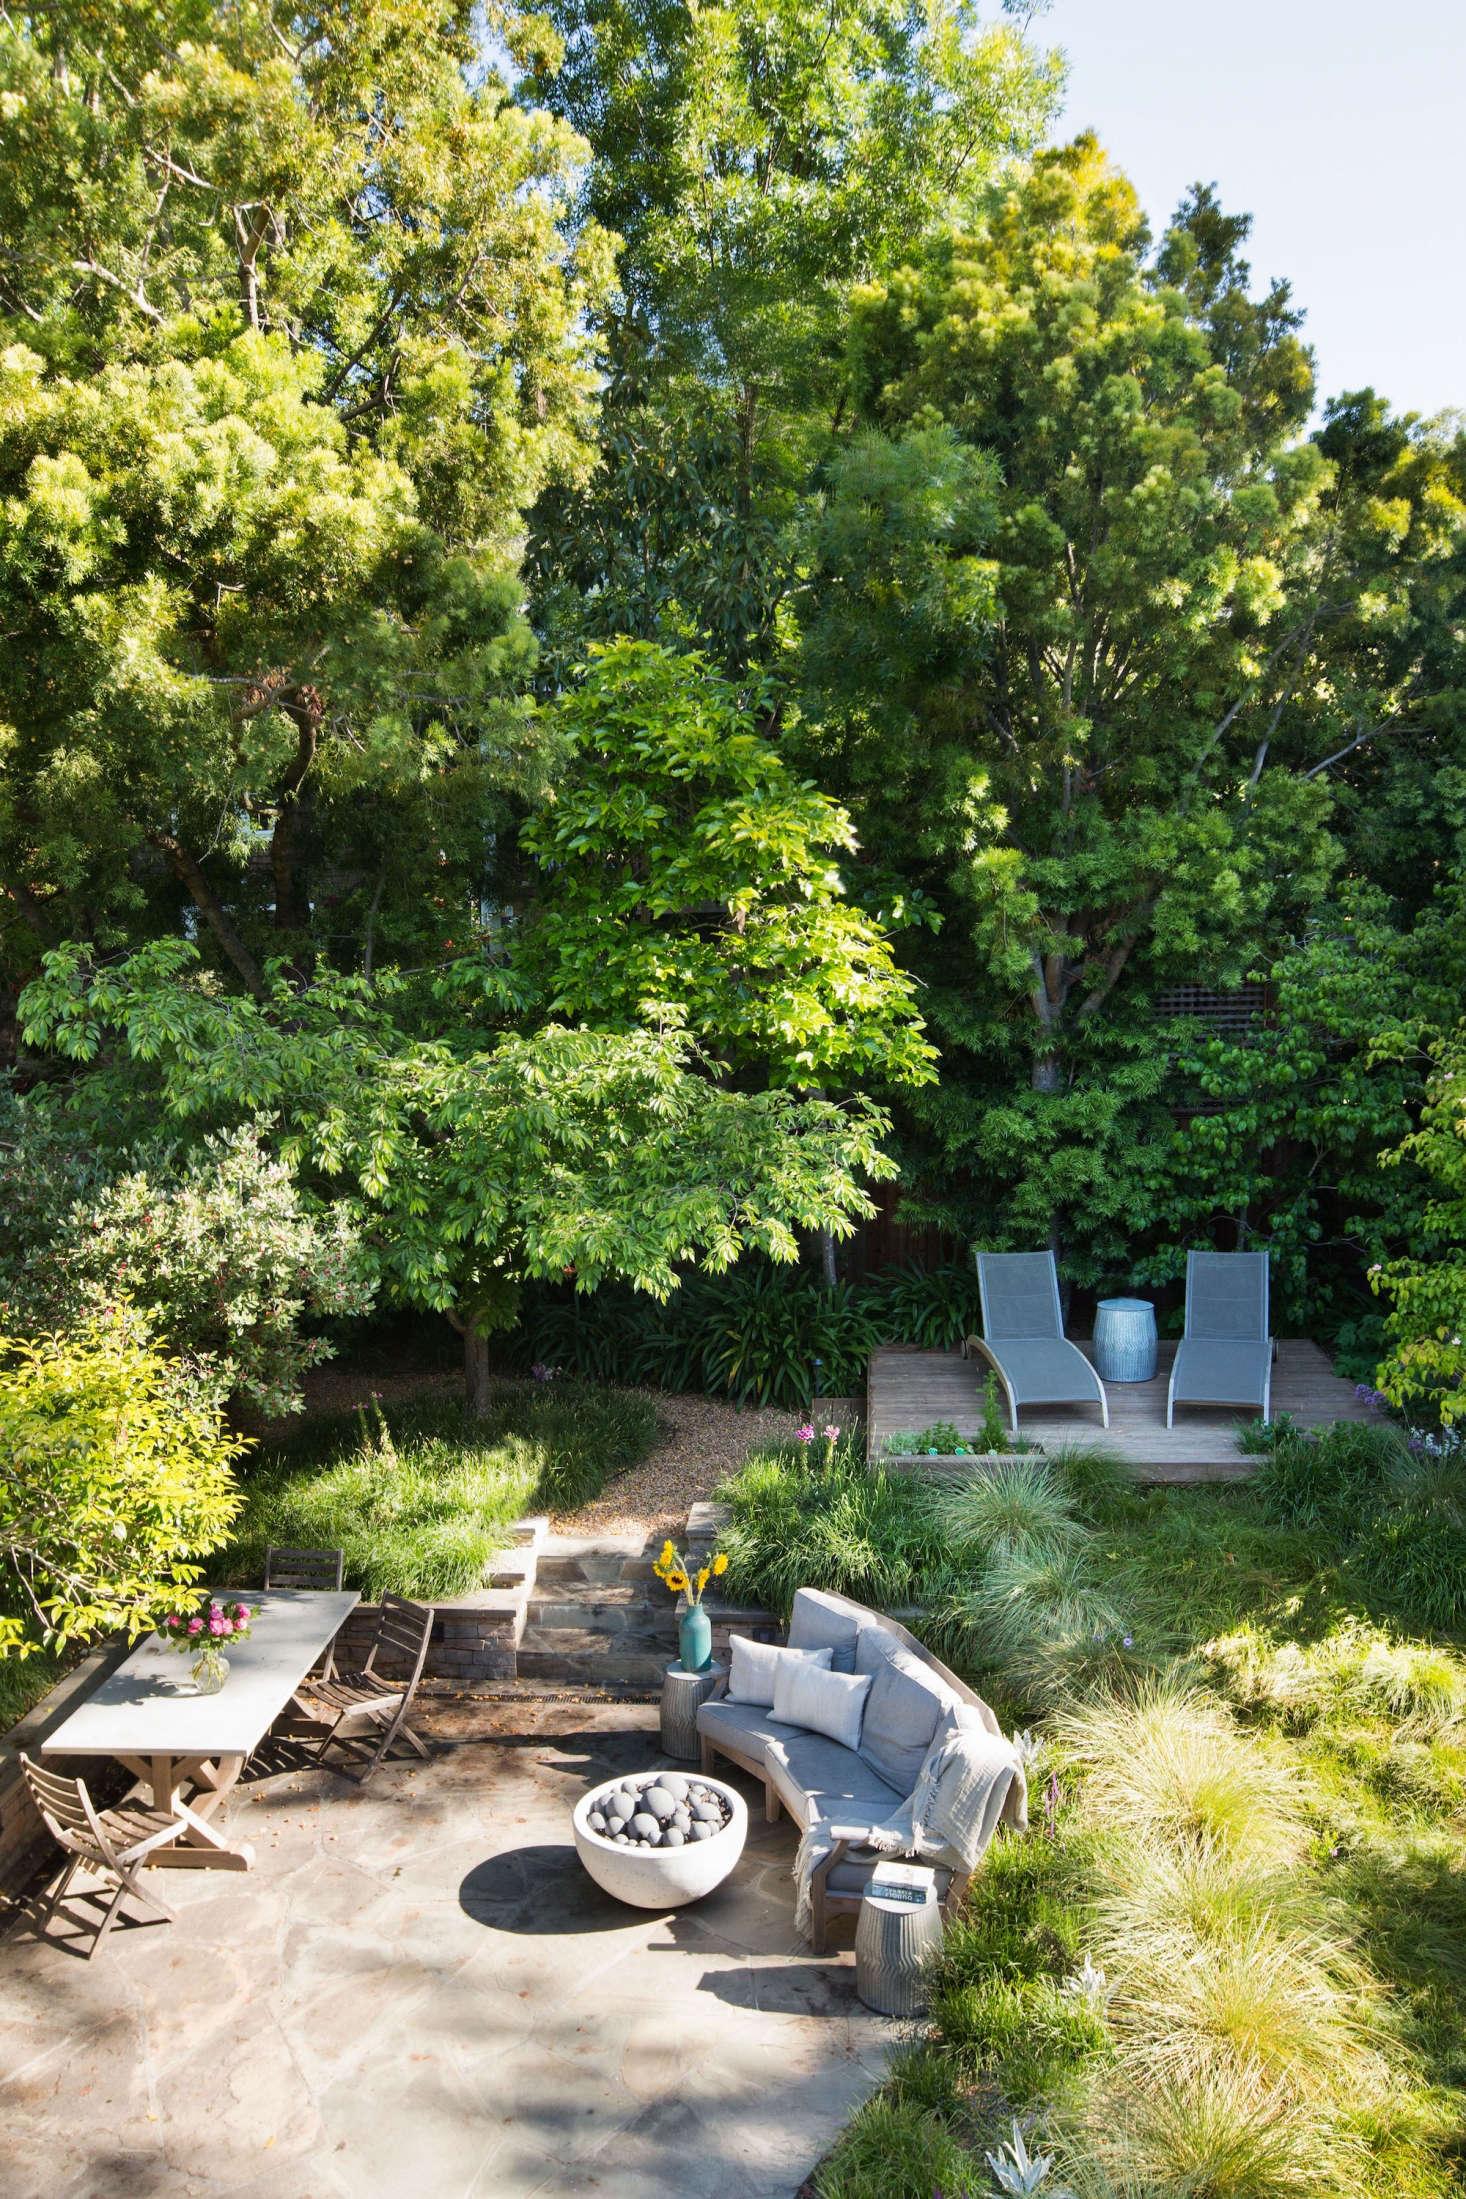 Fullsize Of In The Backyard